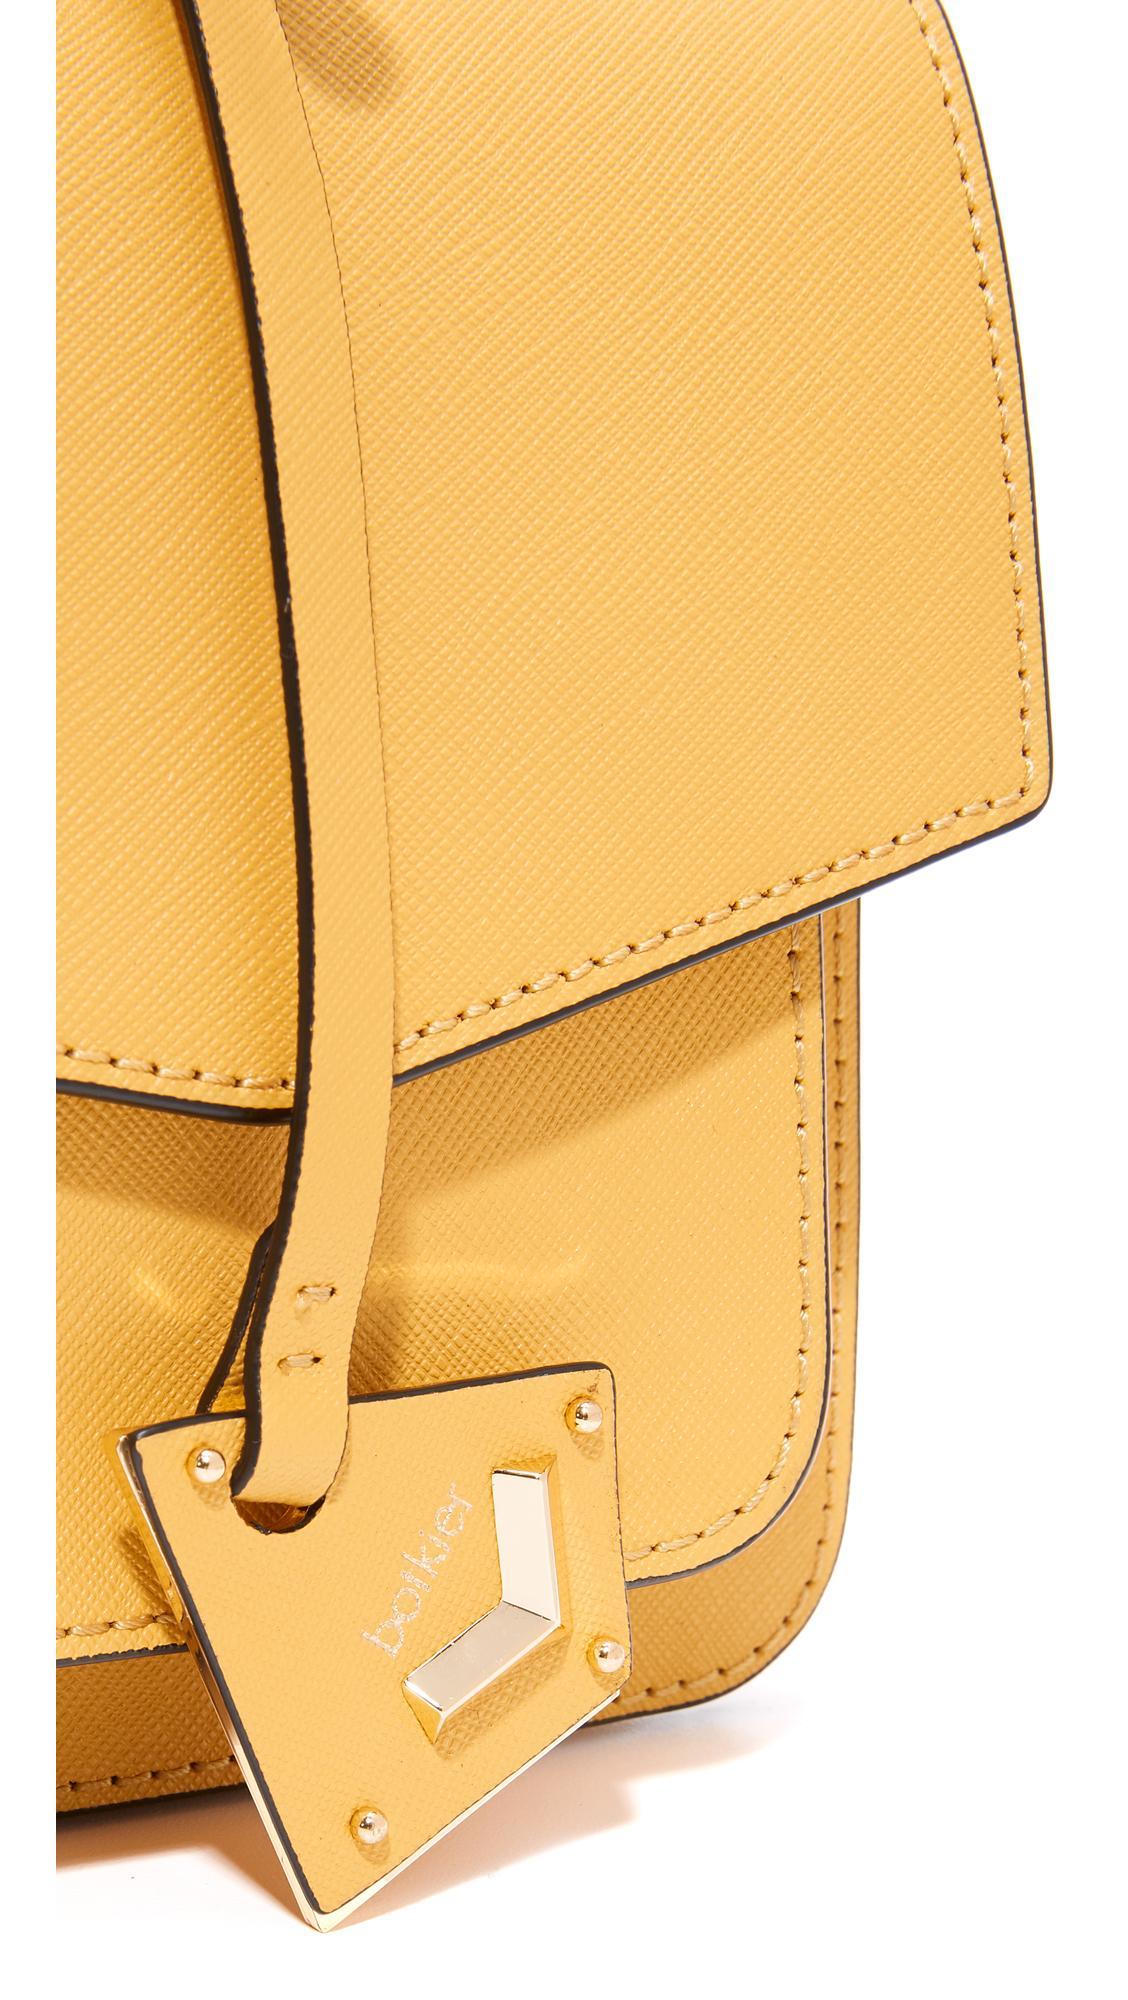 lyst botkier cobble hill mini top handle bag. Black Bedroom Furniture Sets. Home Design Ideas